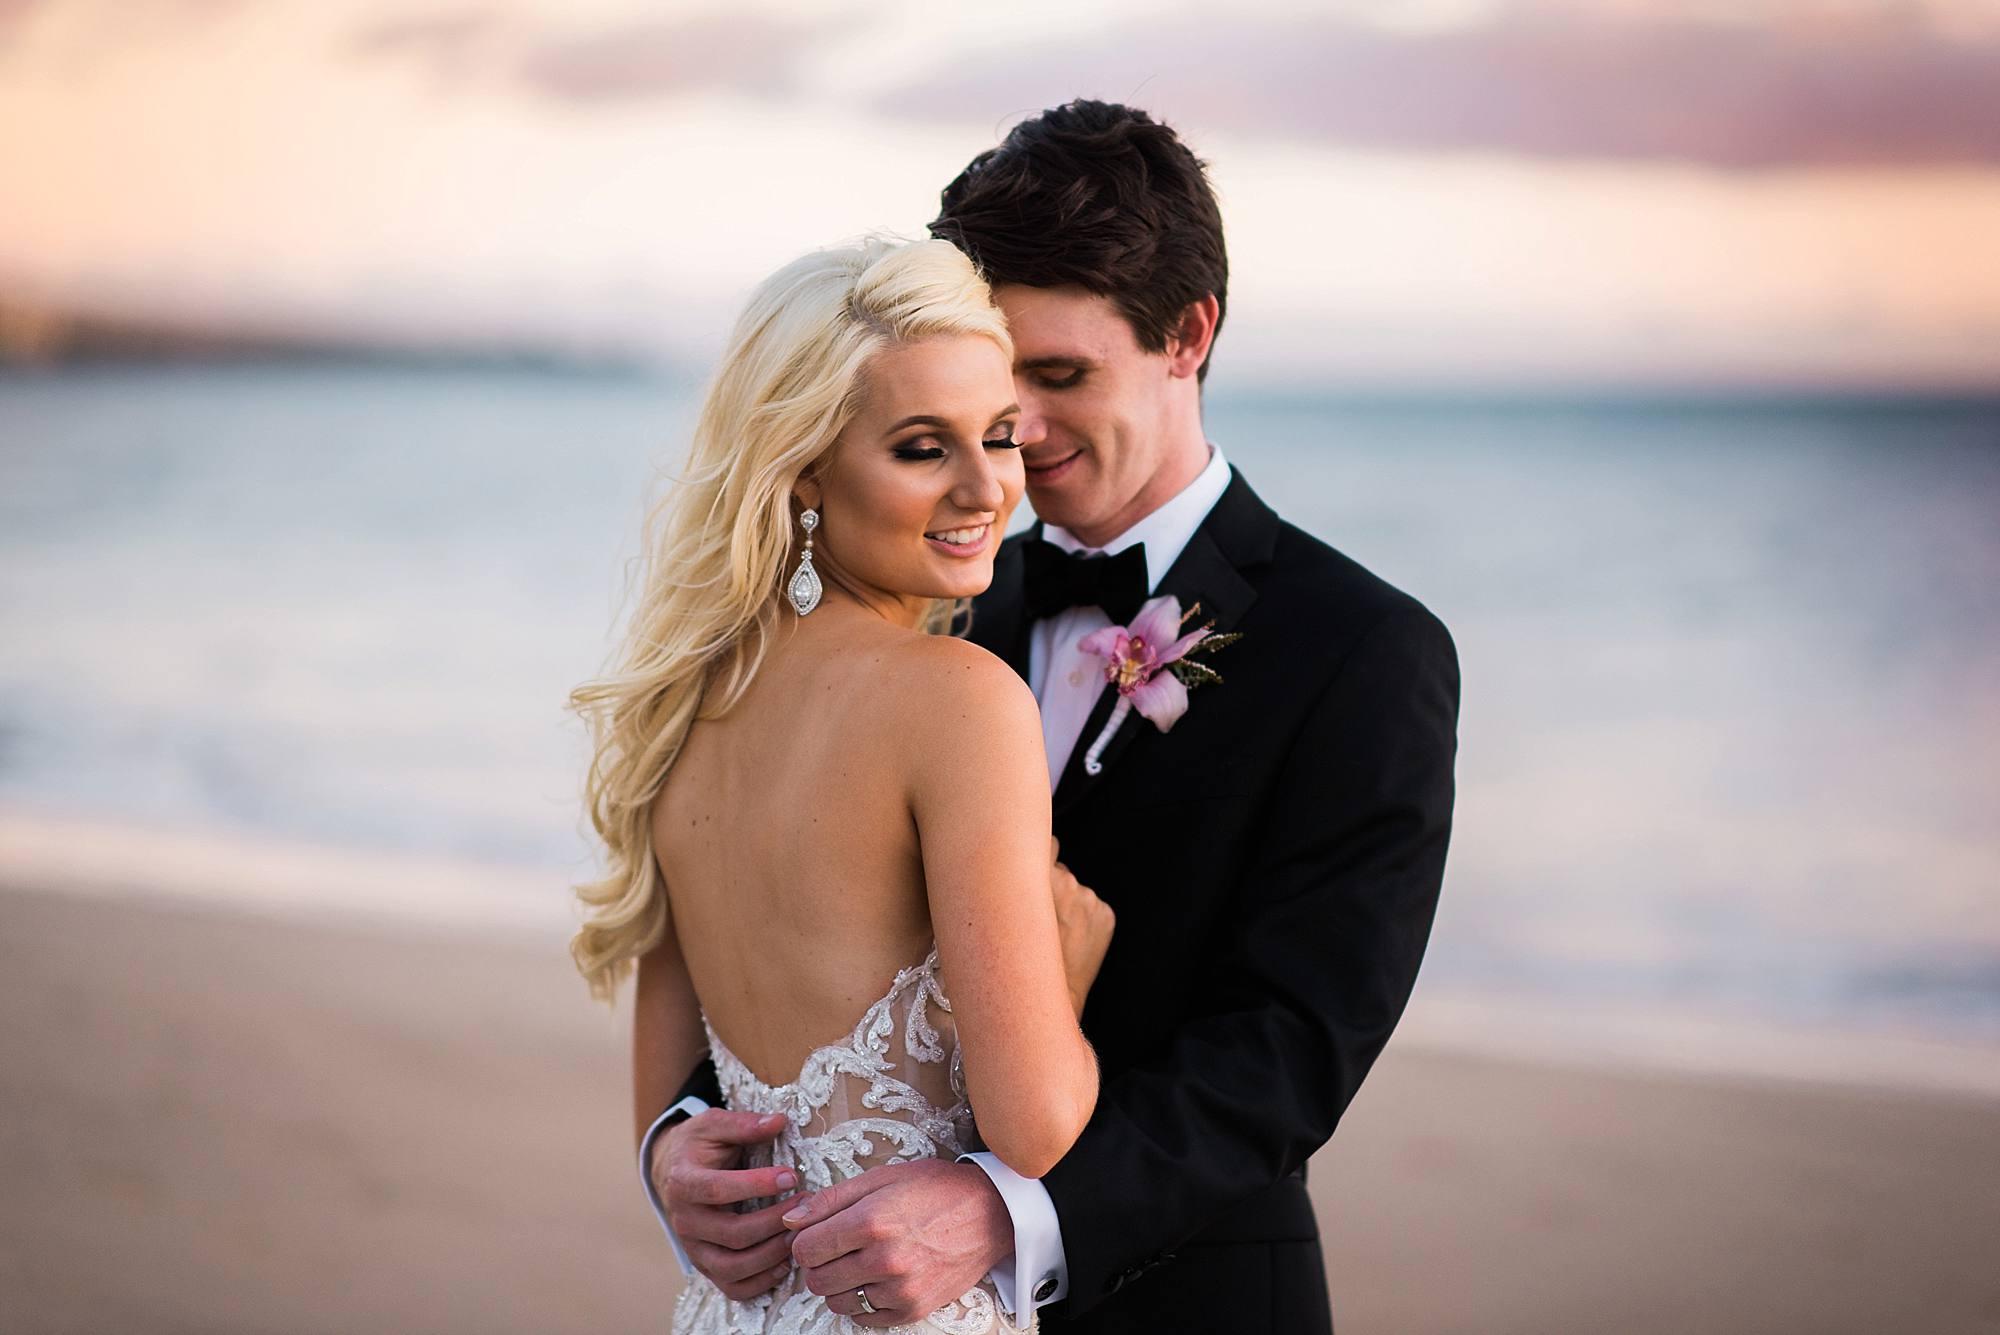 bride and groom snuggling at sugar beach, maui